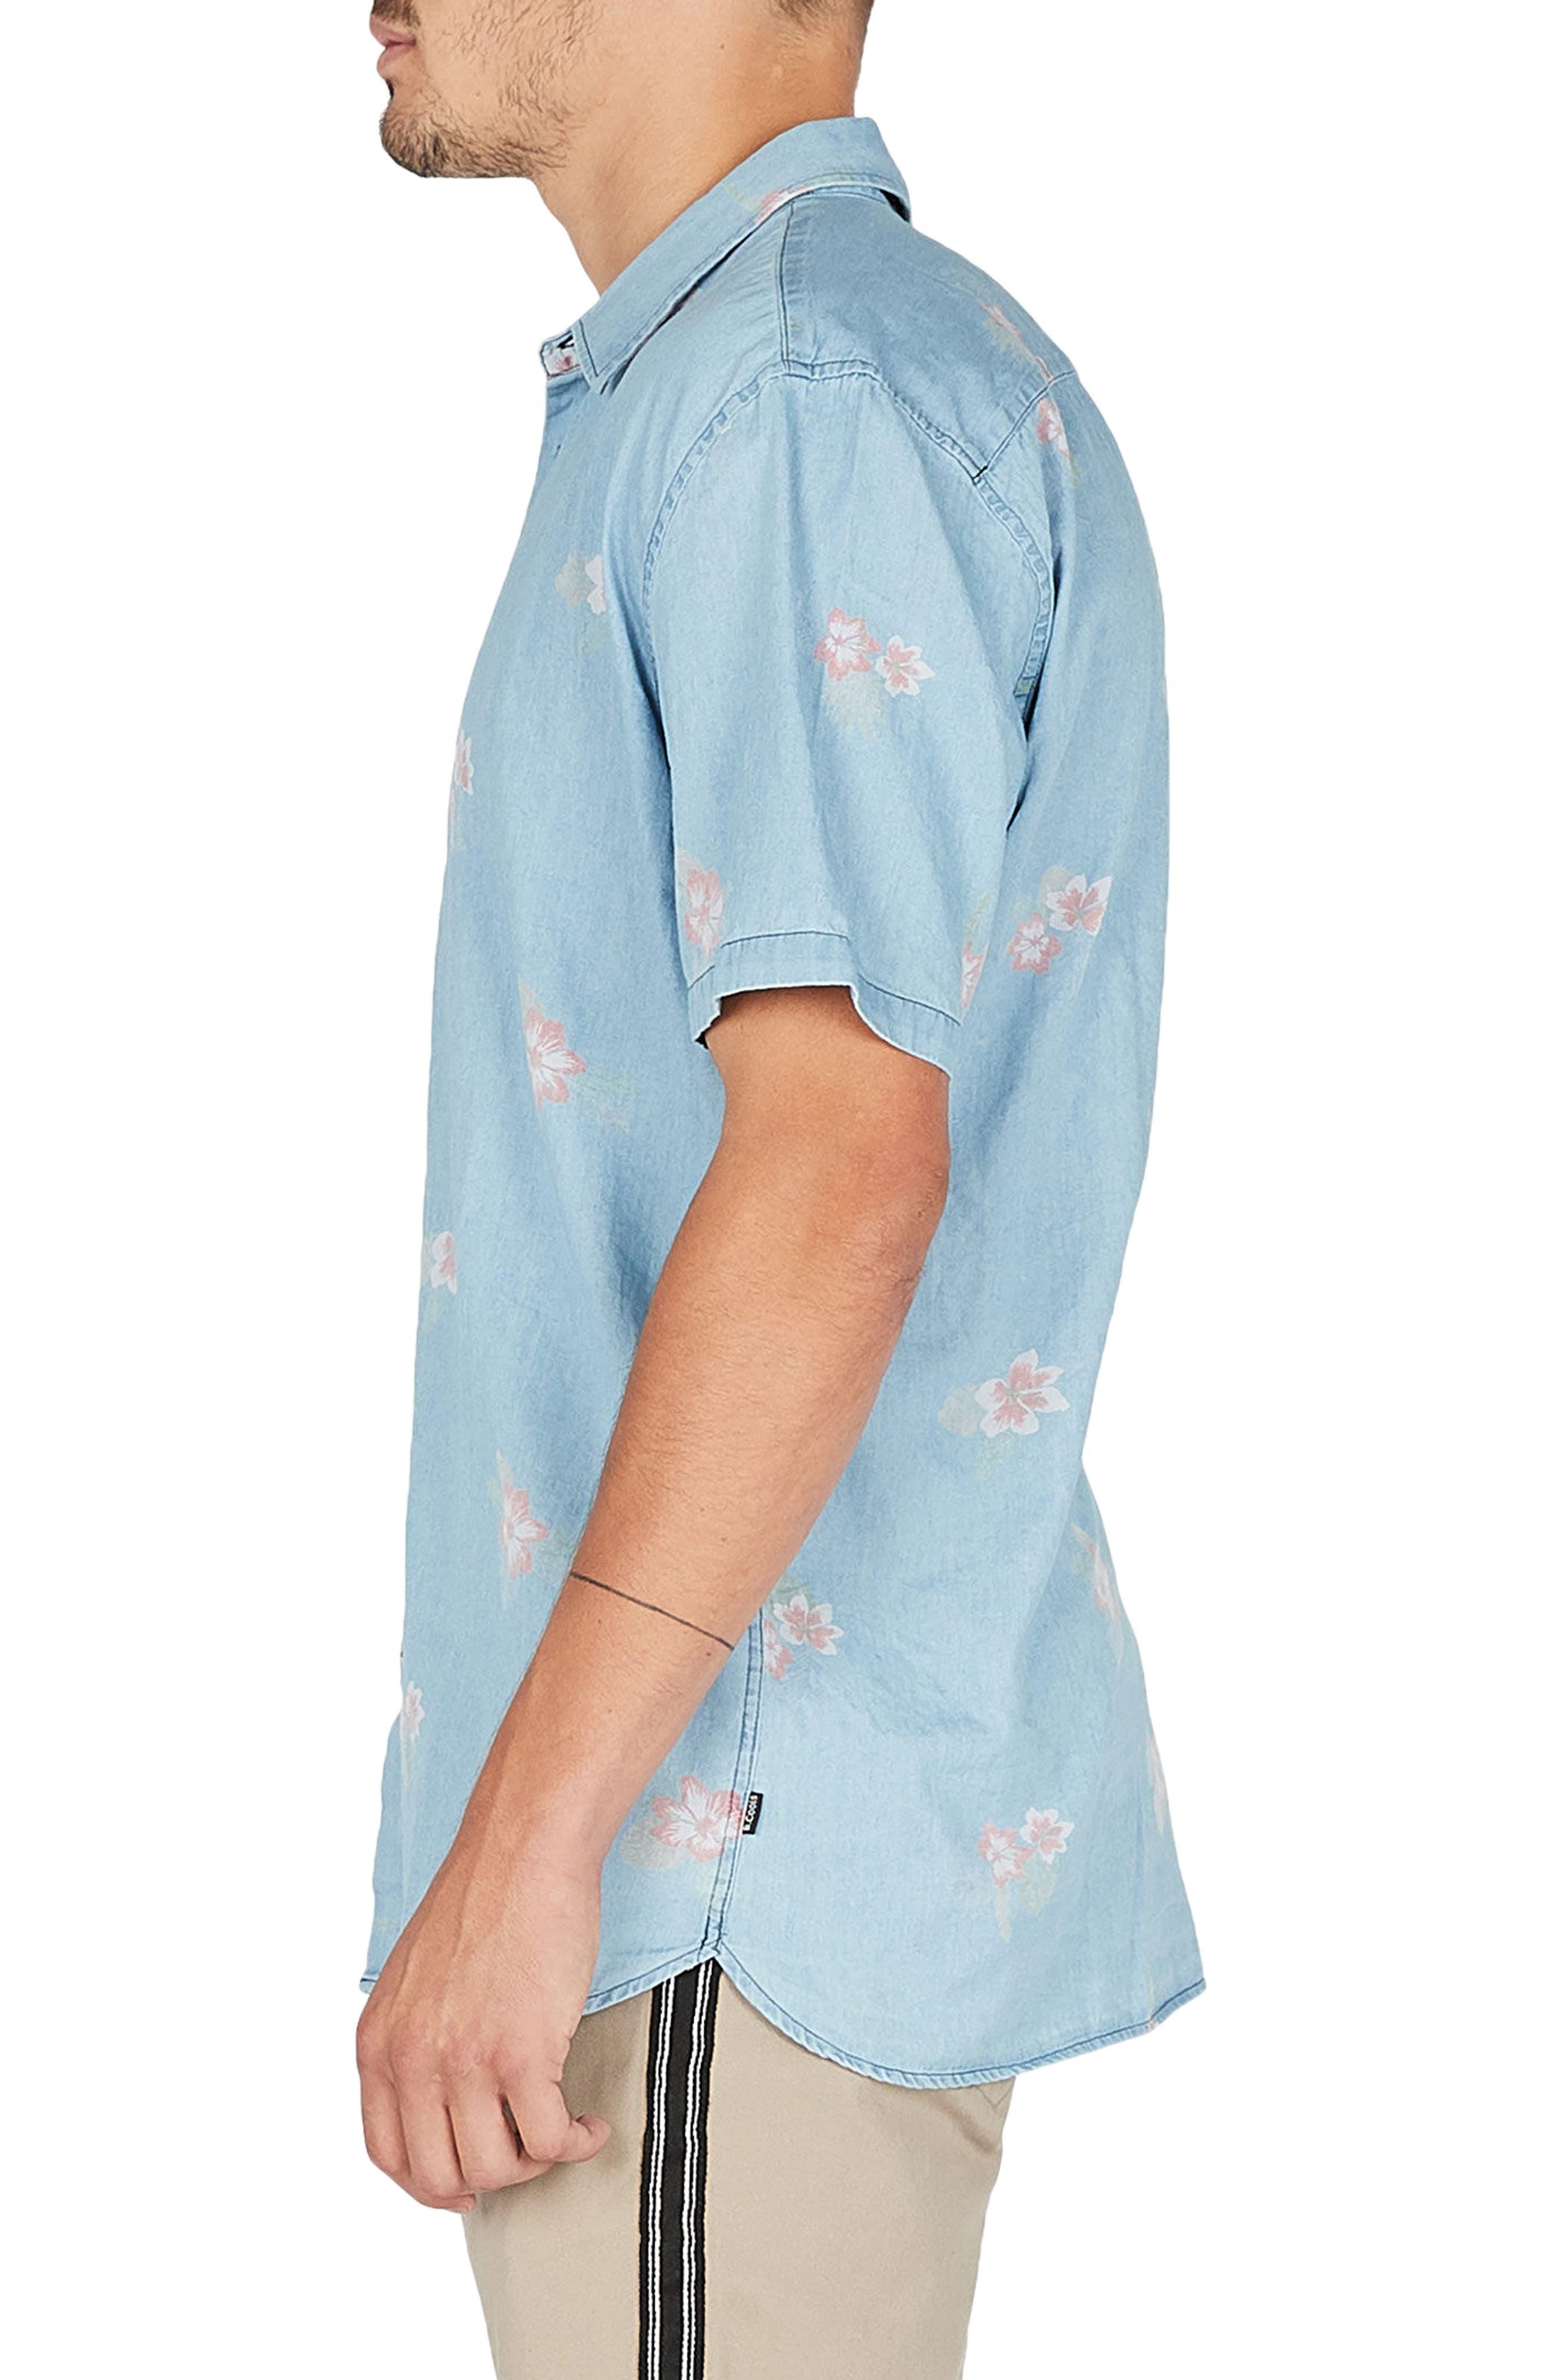 Holiday Woven Shirt,                             Alternate thumbnail 4, color,                             Indigo/ Floral